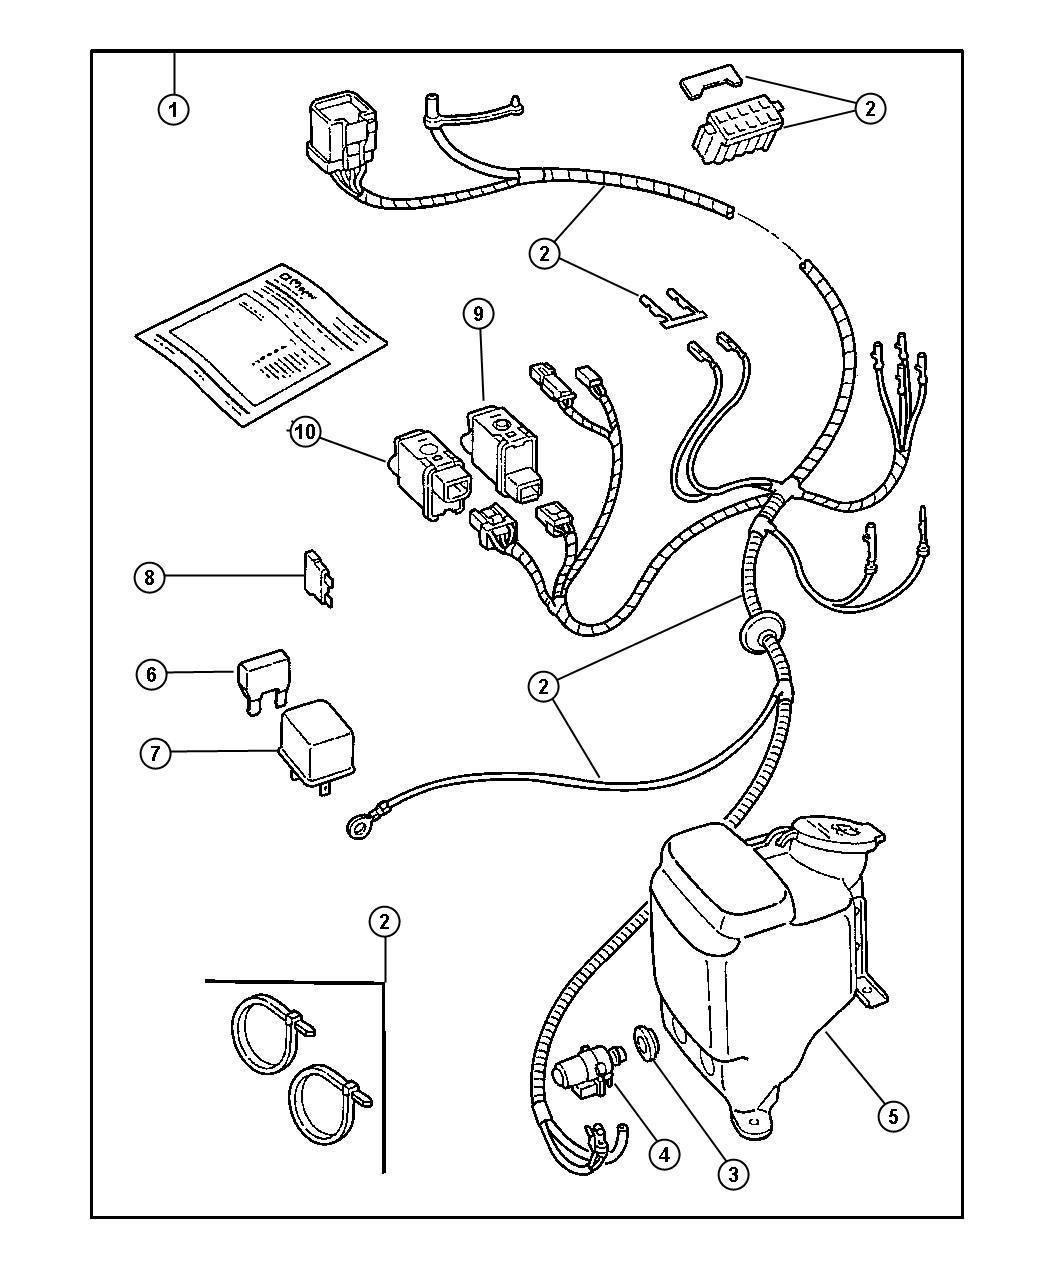 2000 Jeep Wrangler Hardtop Wiring Kit.